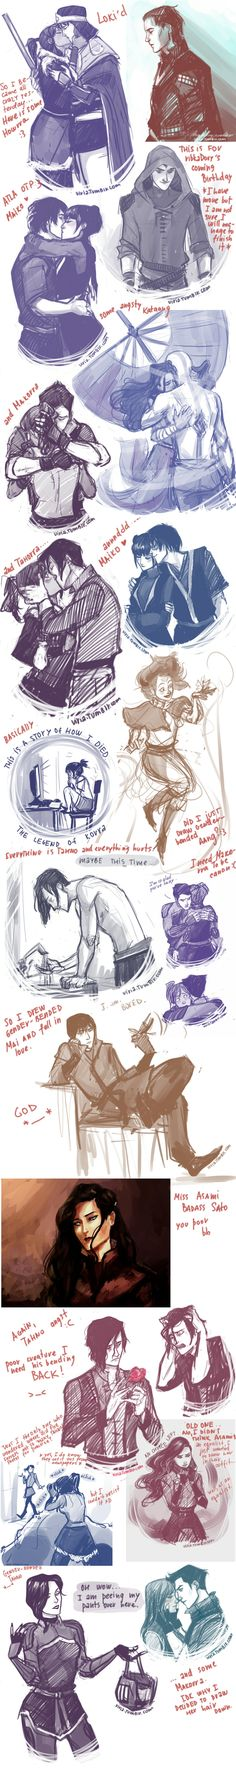 Avatar and Korra Aang Y Katara, Korra Avatar, Team Avatar, Crossover, Sketches Of Love, Drawing Sketches, Beautiful Sketches, Drawing Skills, Legend Of Aang